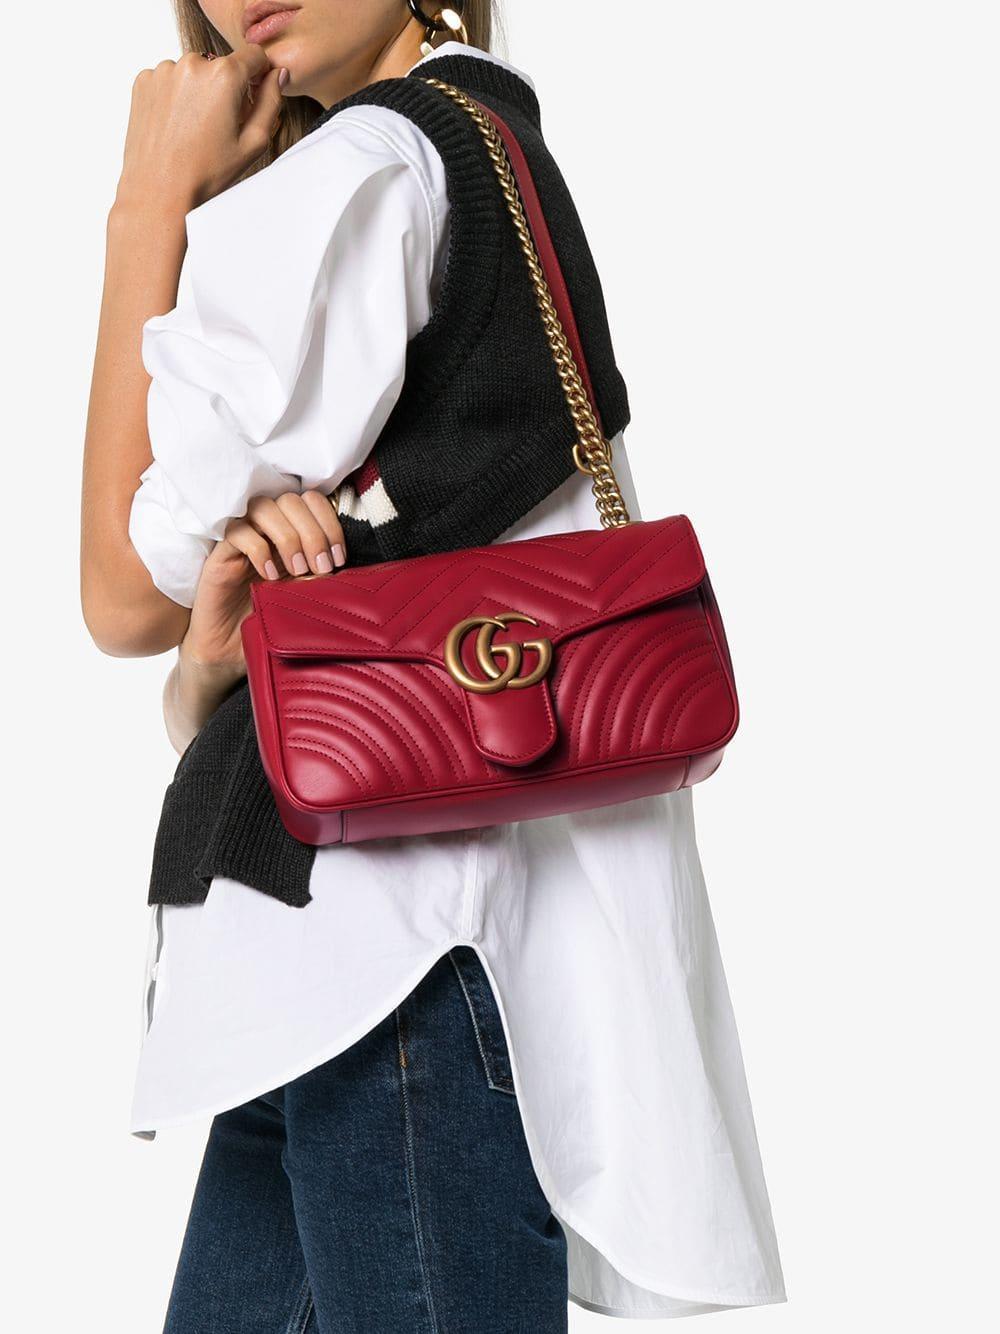 9a4384b92be19b Gucci - Red GG Marmont Small Matelassé Shoulder Bag - Lyst. View fullscreen